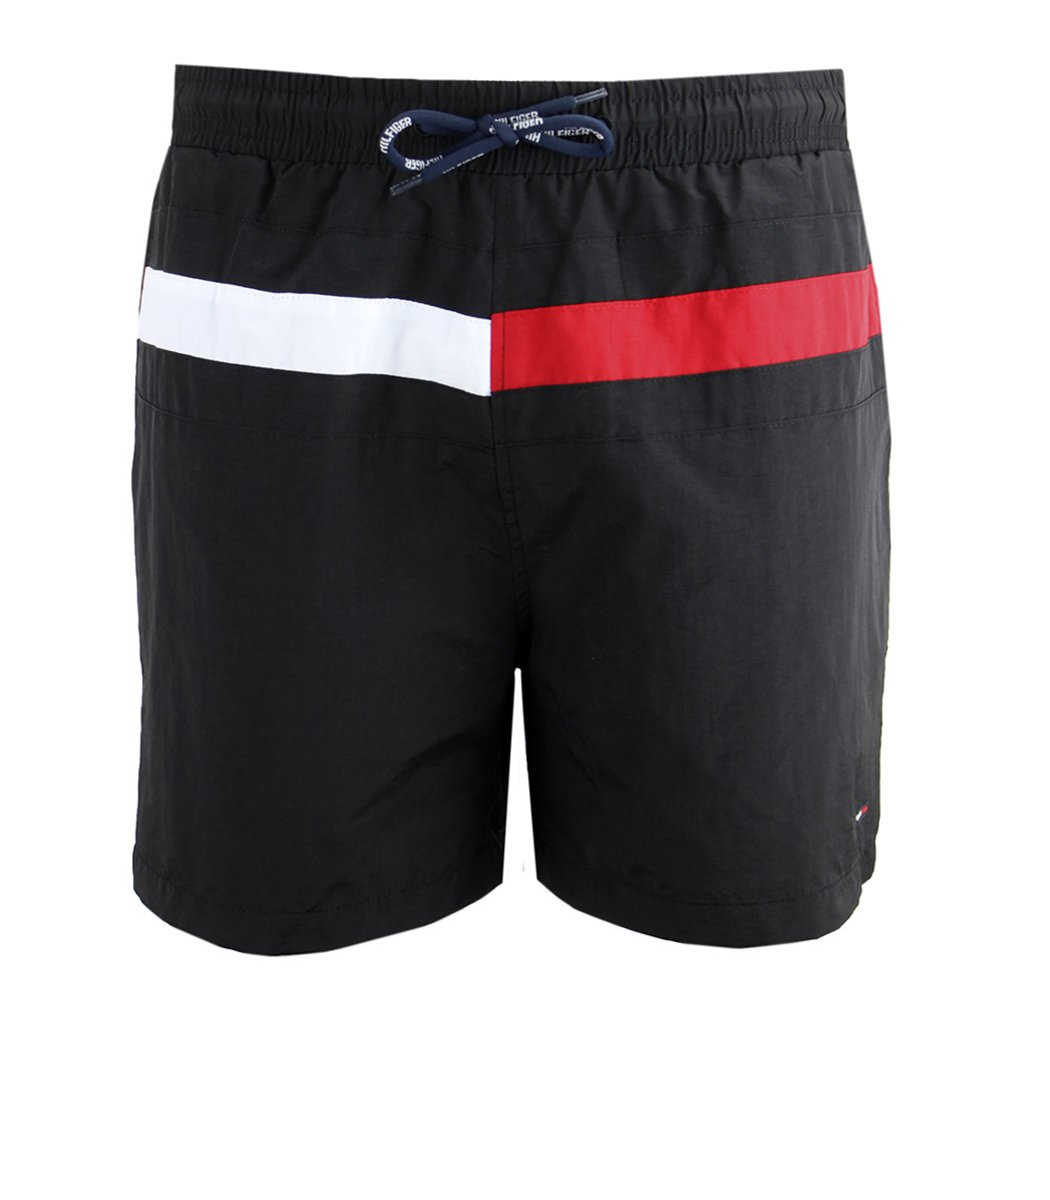 Черные шорты Tommy Hilfiger Dolphin 2 с карманом